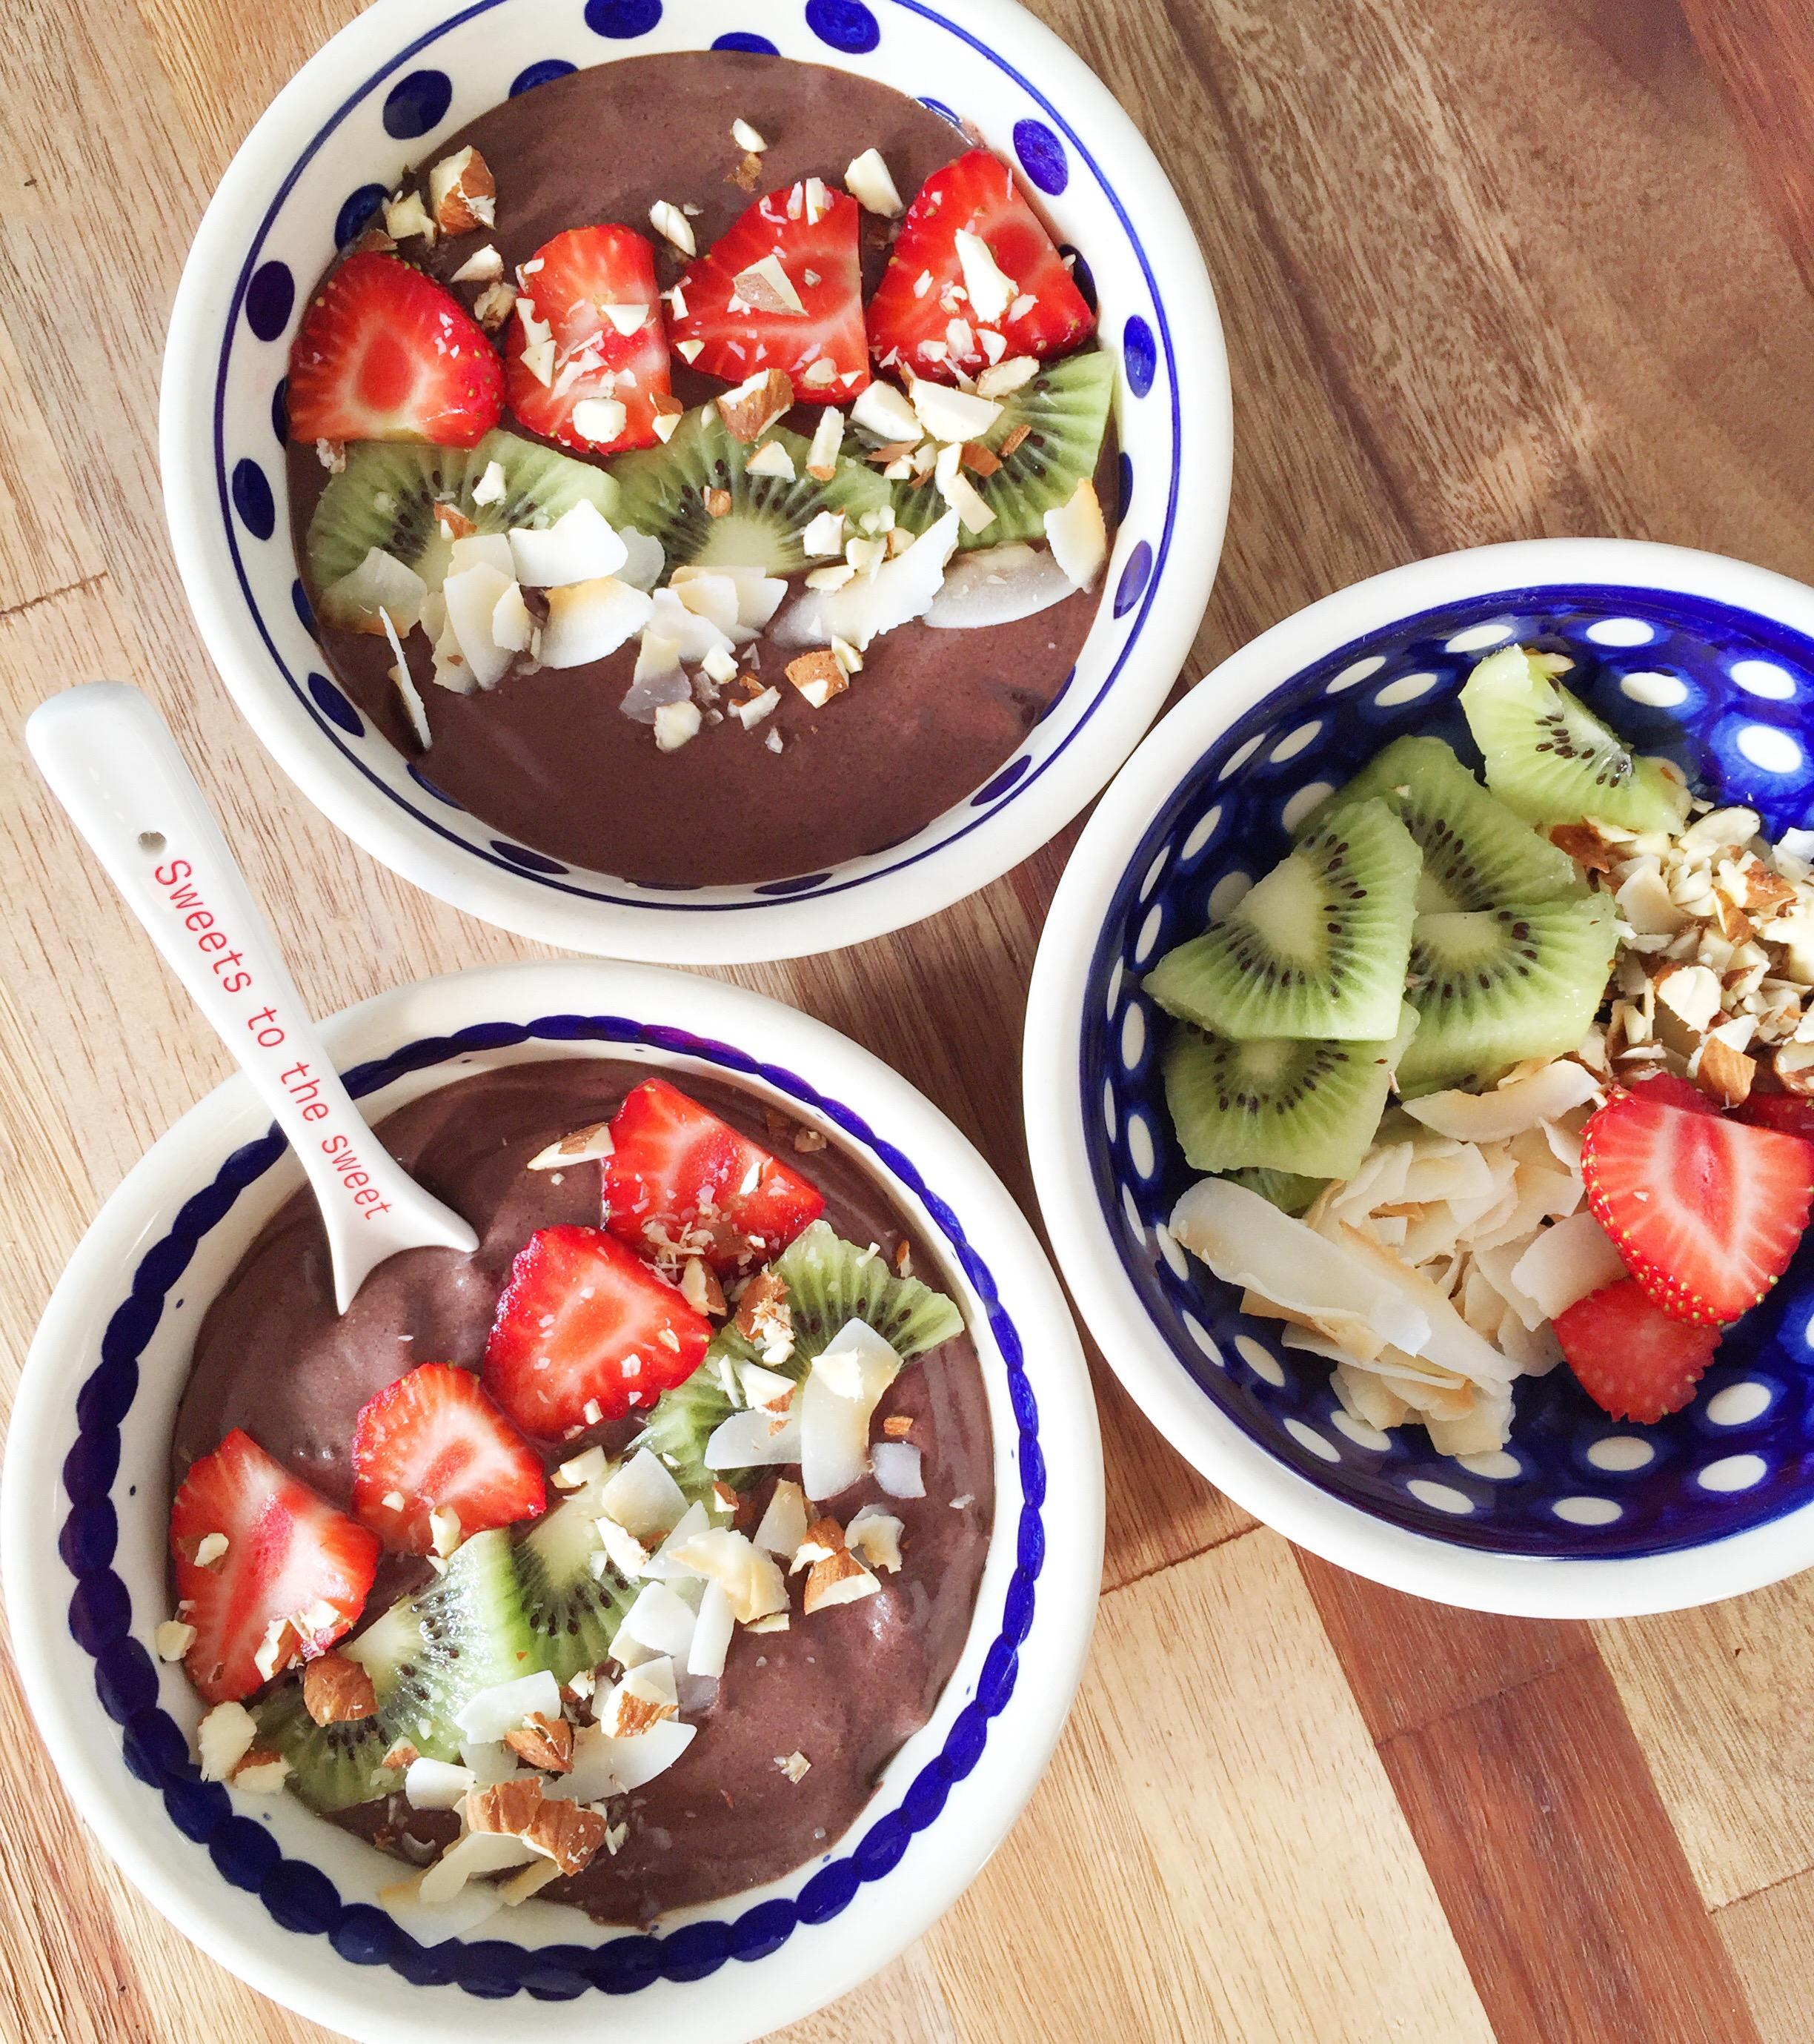 Kakao / chokolade smoothie bowl med dadler, jordbær og kiwi